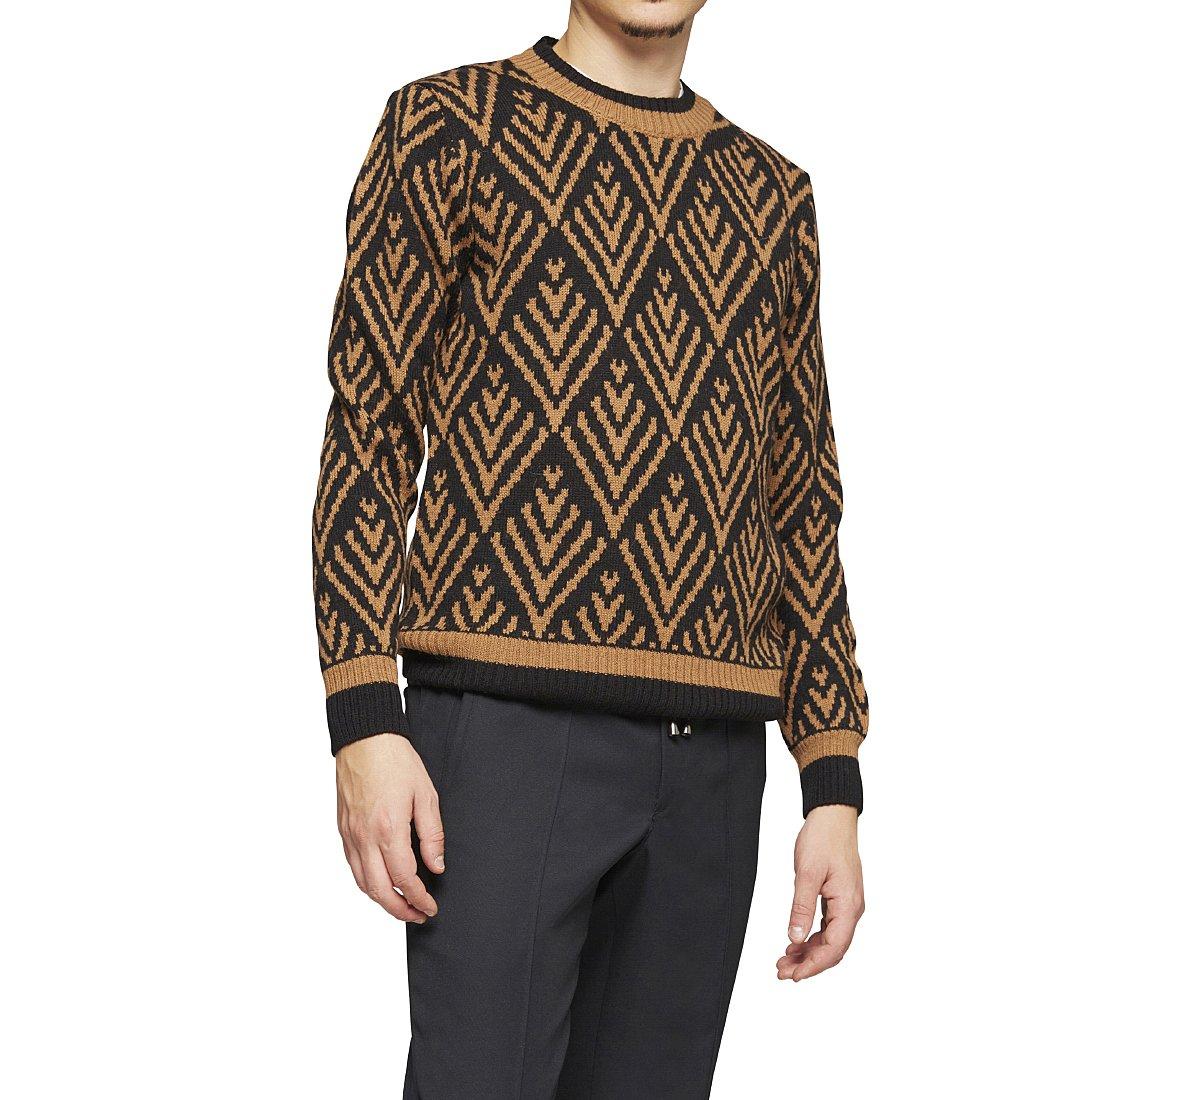 Pullover in stile etnico bicolore